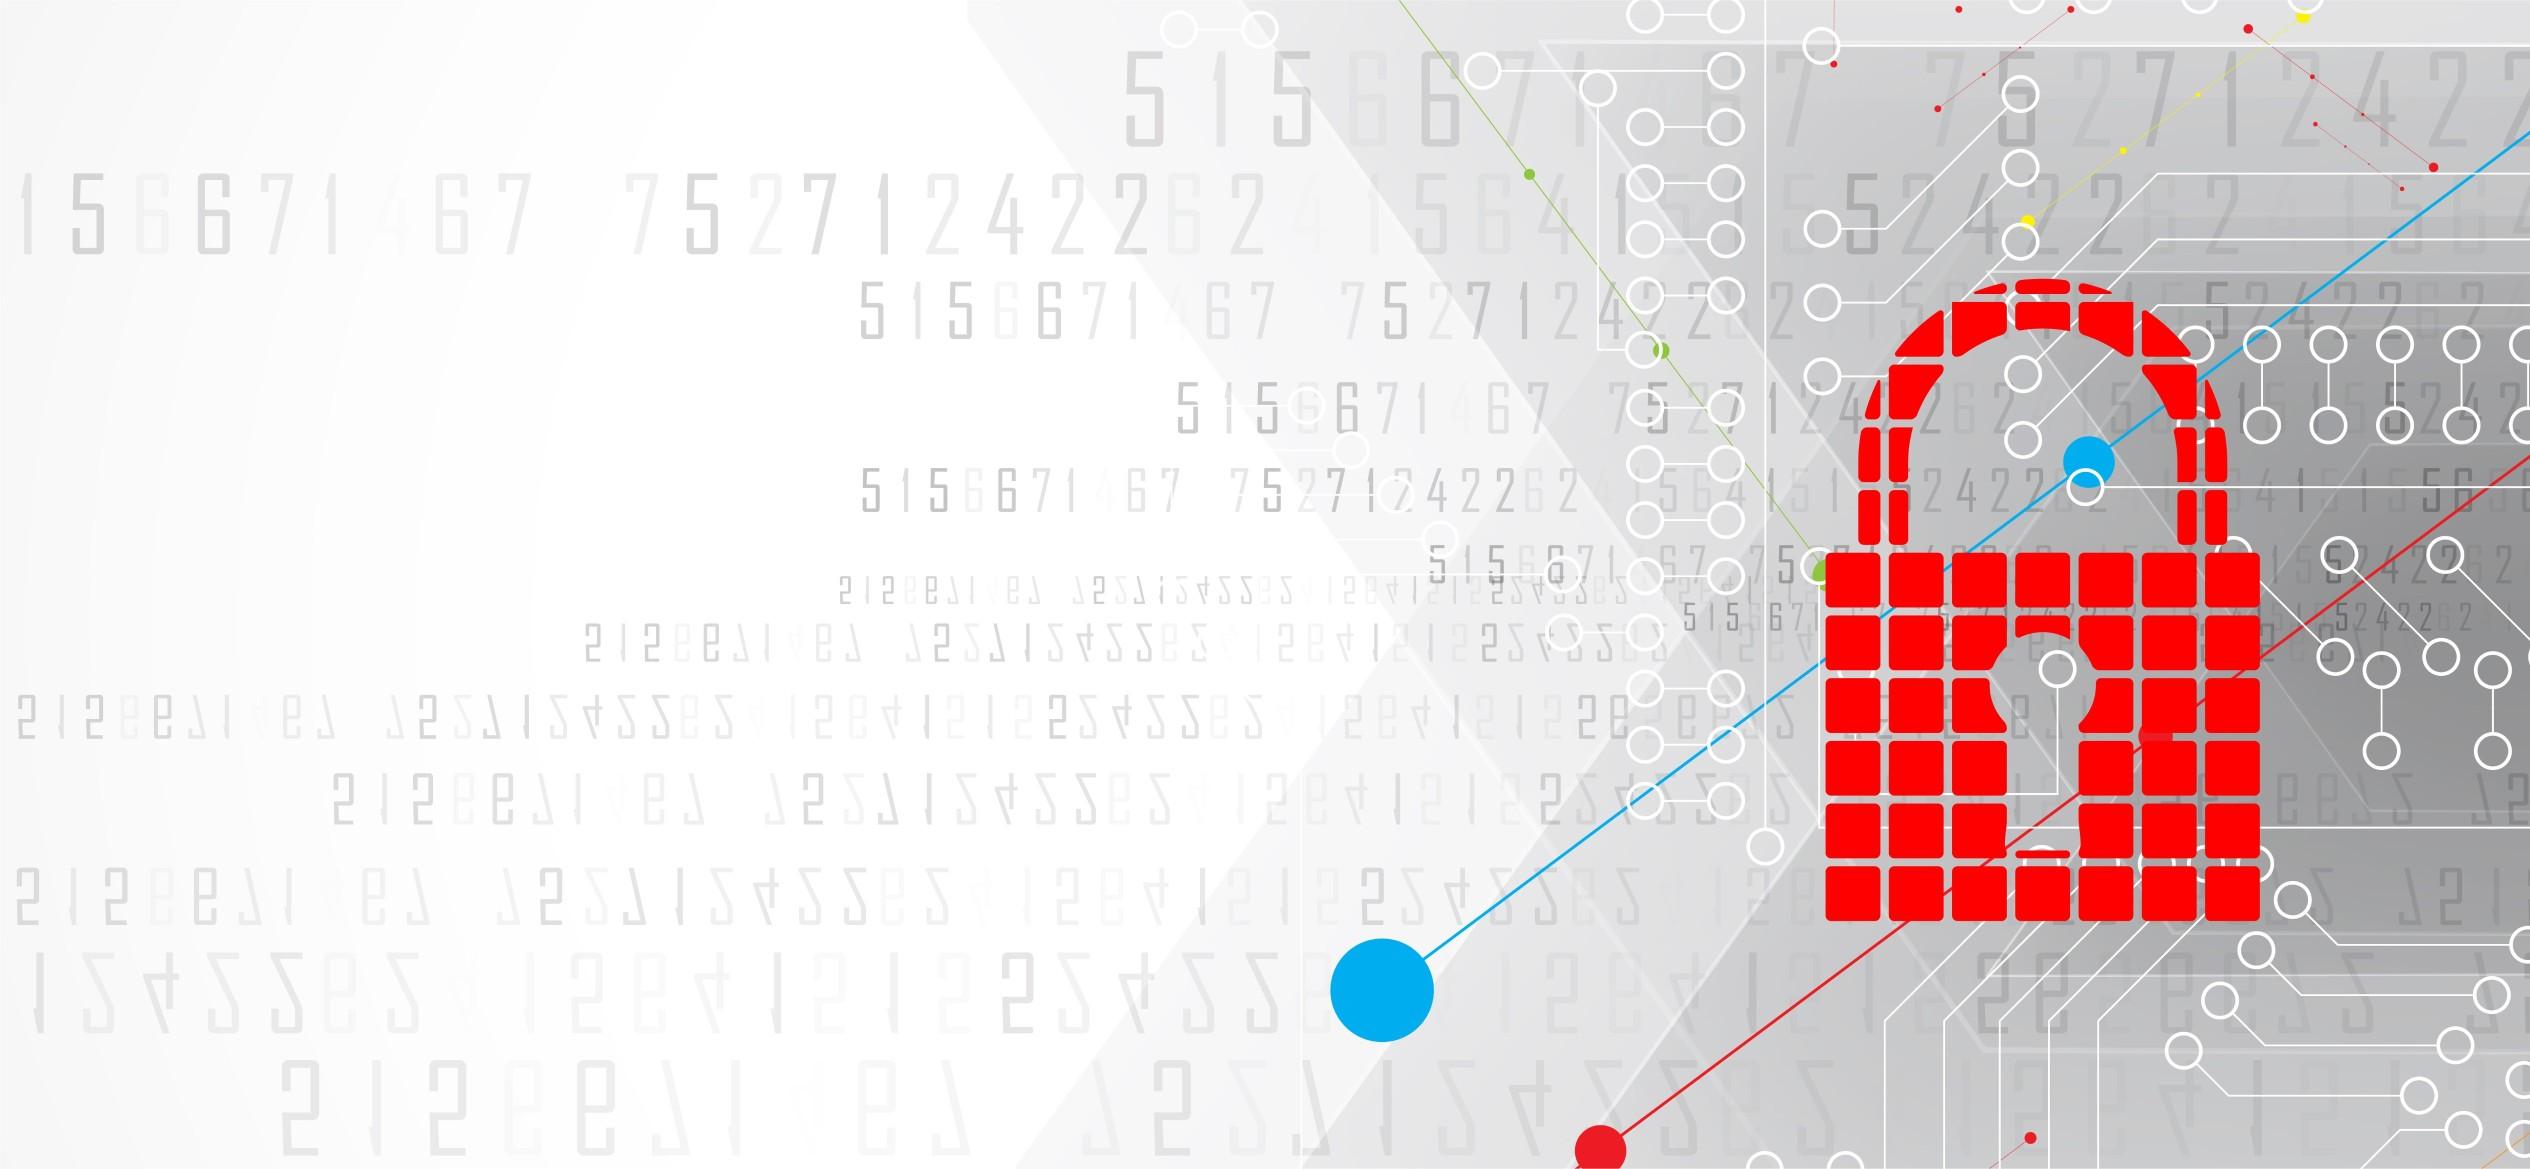 NIST Cybersecurity Framework Explained